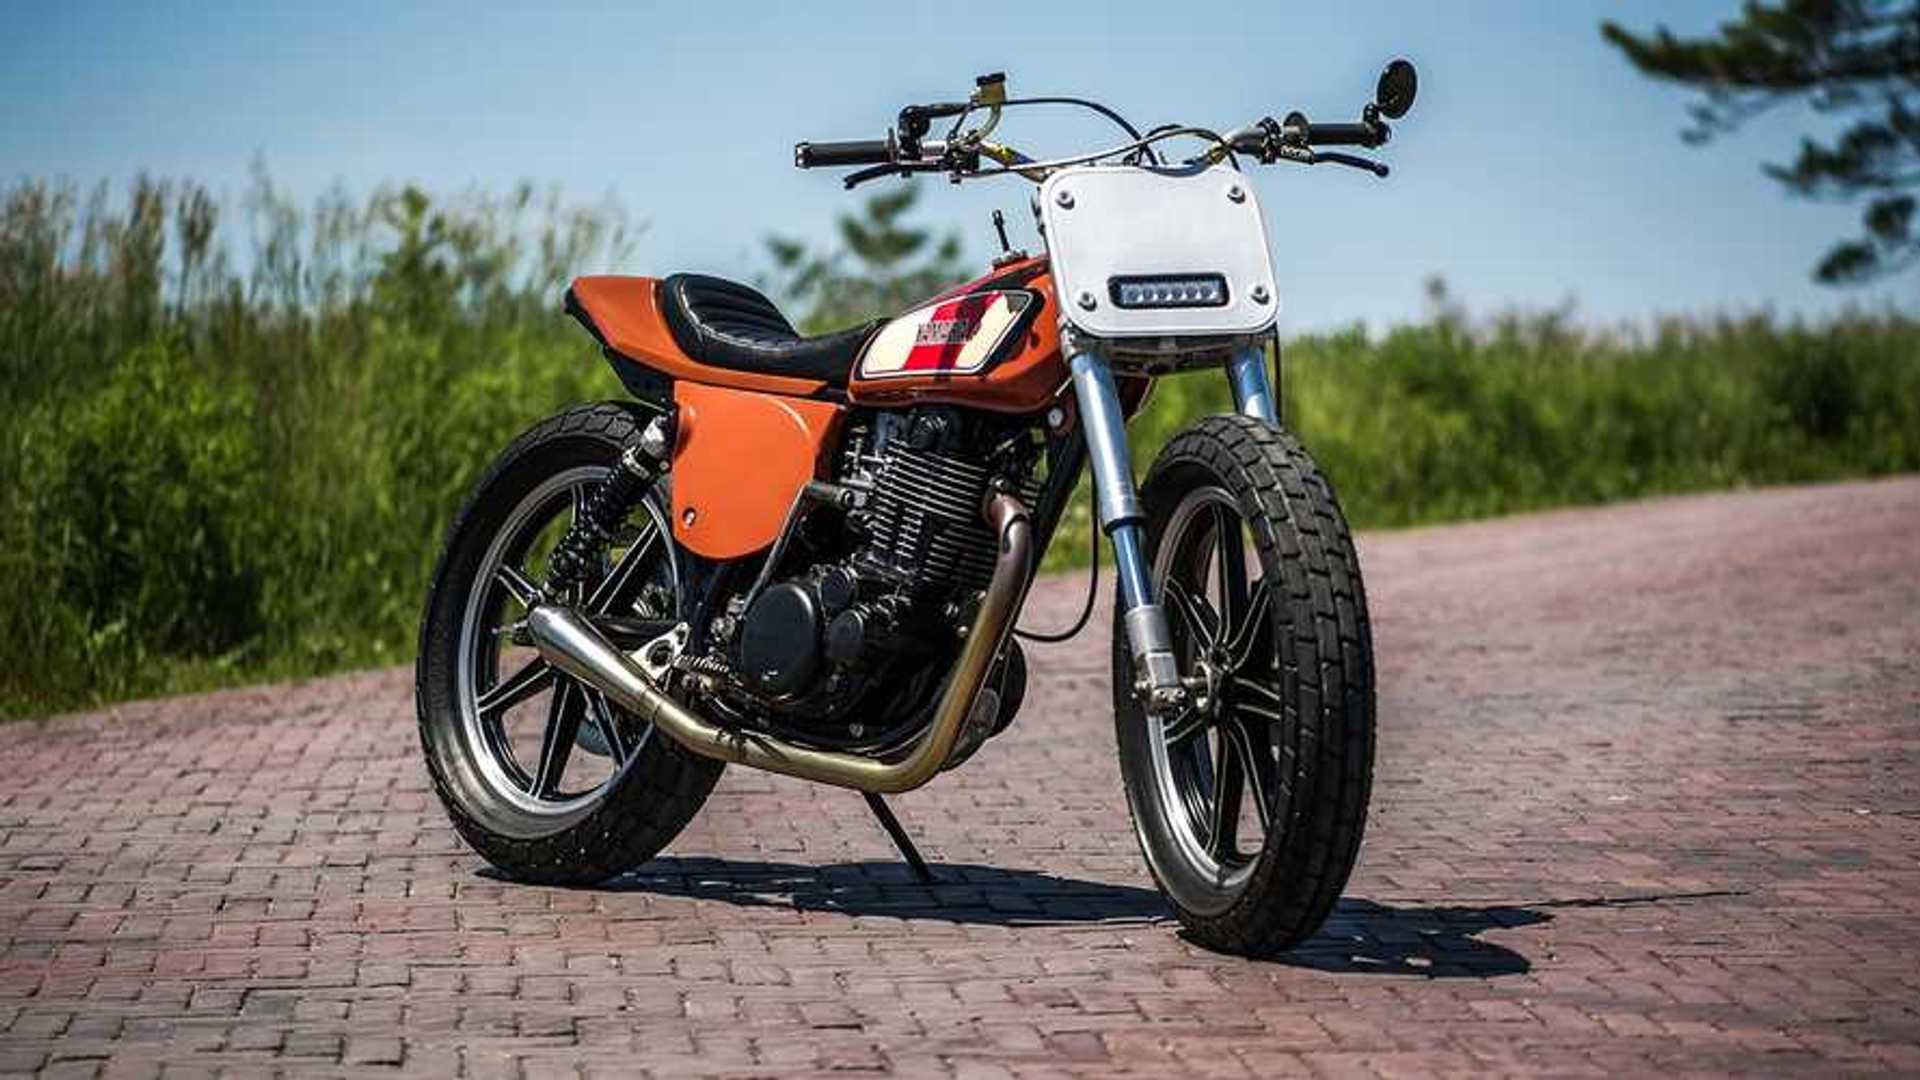 A Lovingly Restored Yamaha XT500 Is The Best Family Heirloom